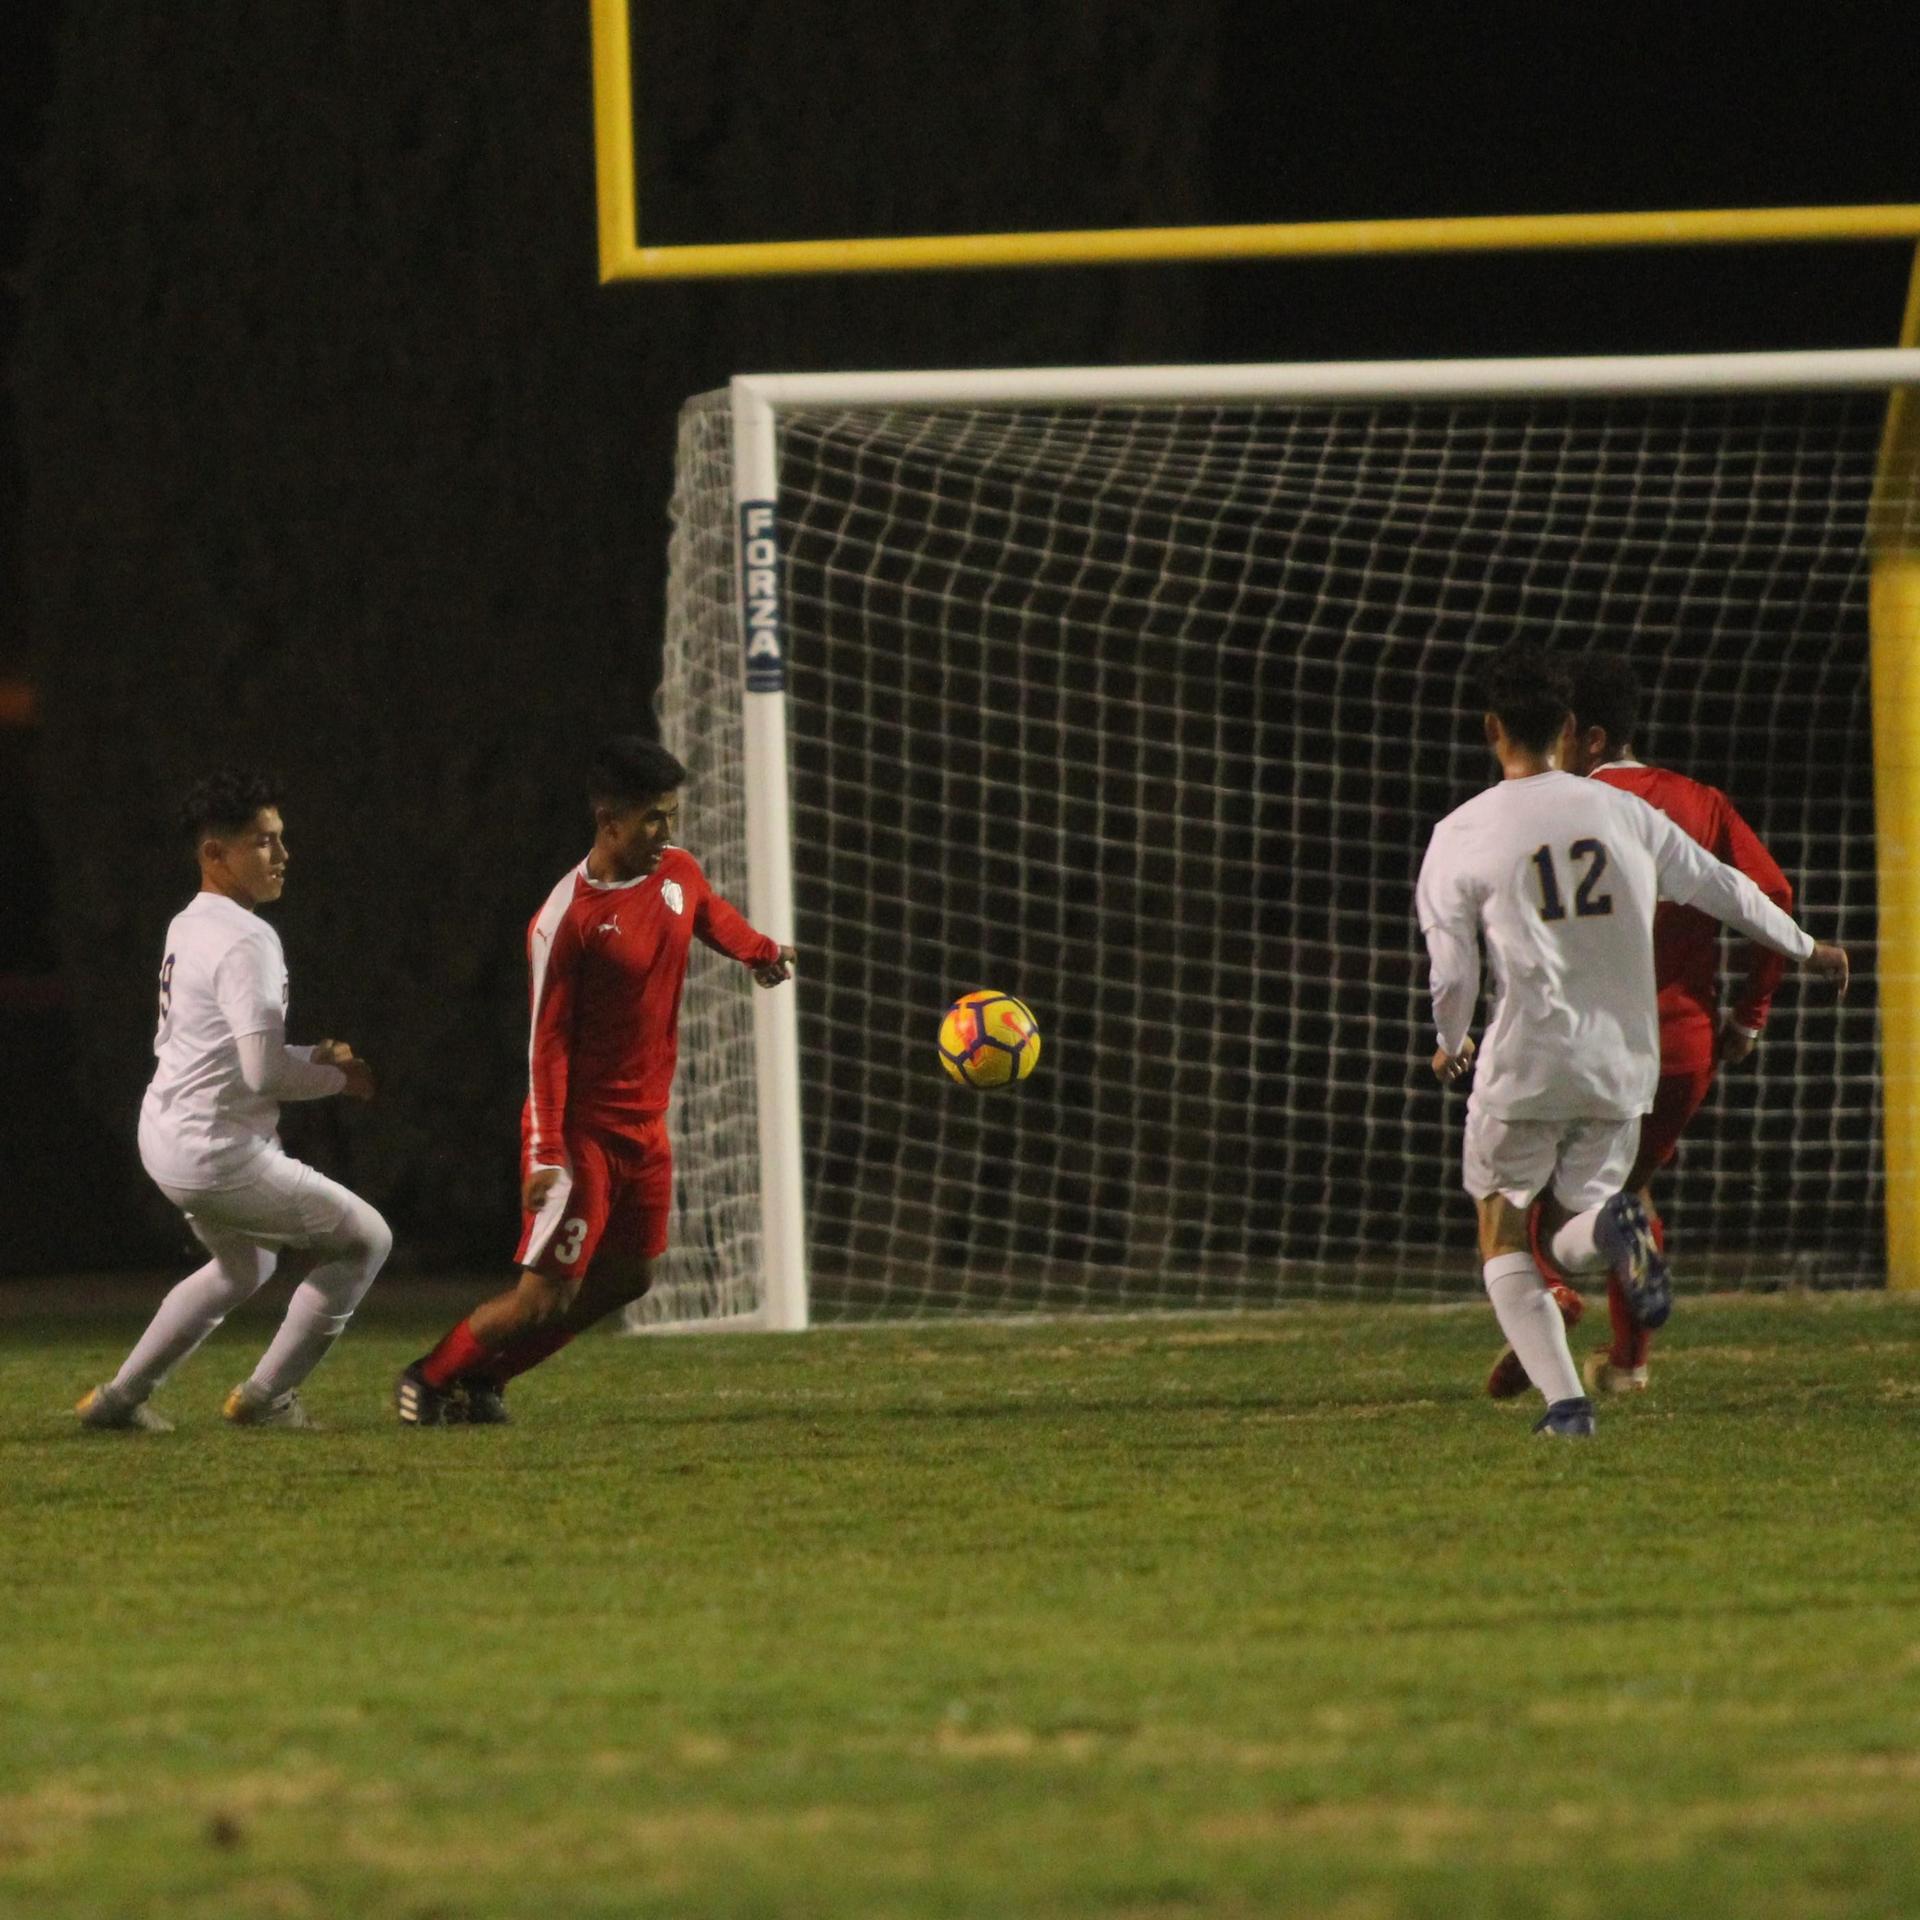 Alejandro Montes Attacking the Ball